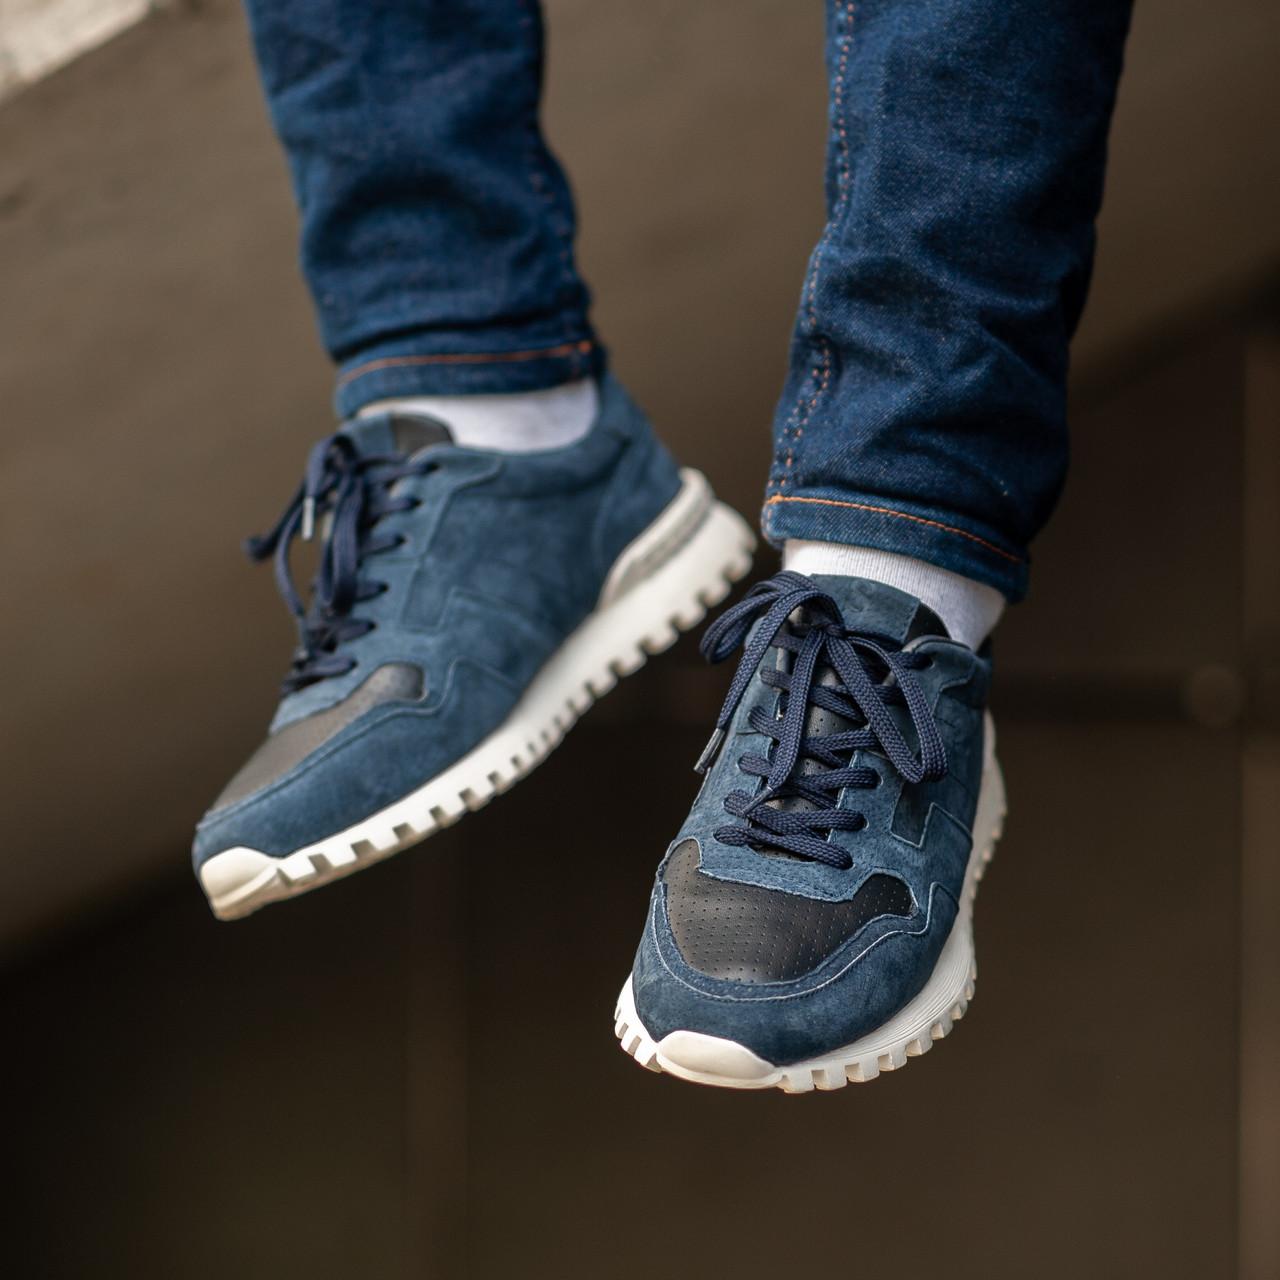 Мужские кроссовки South Classic blue. Натуральная замша